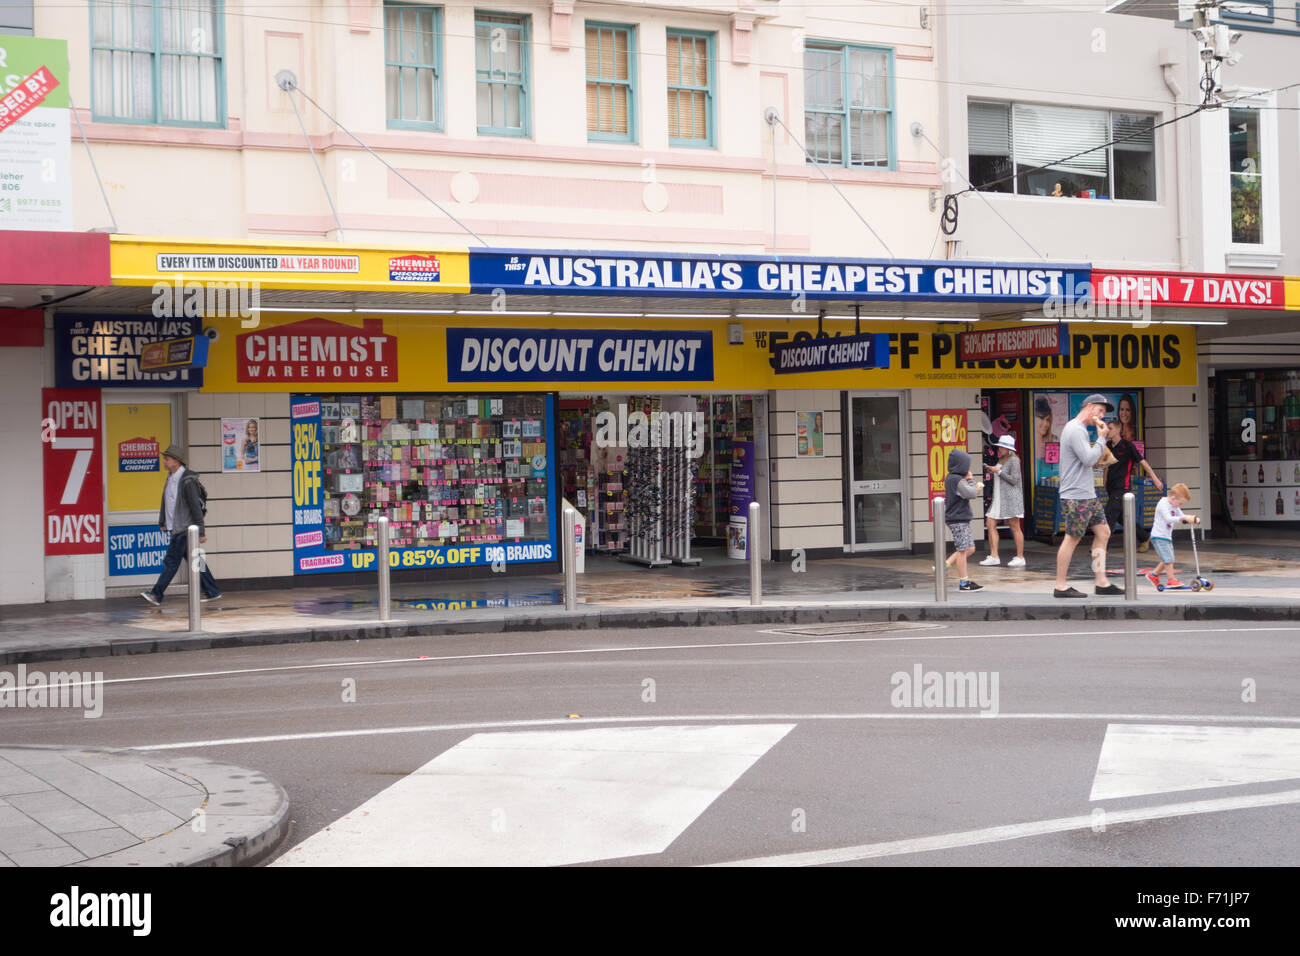 discount chemist Australia - Stock Image